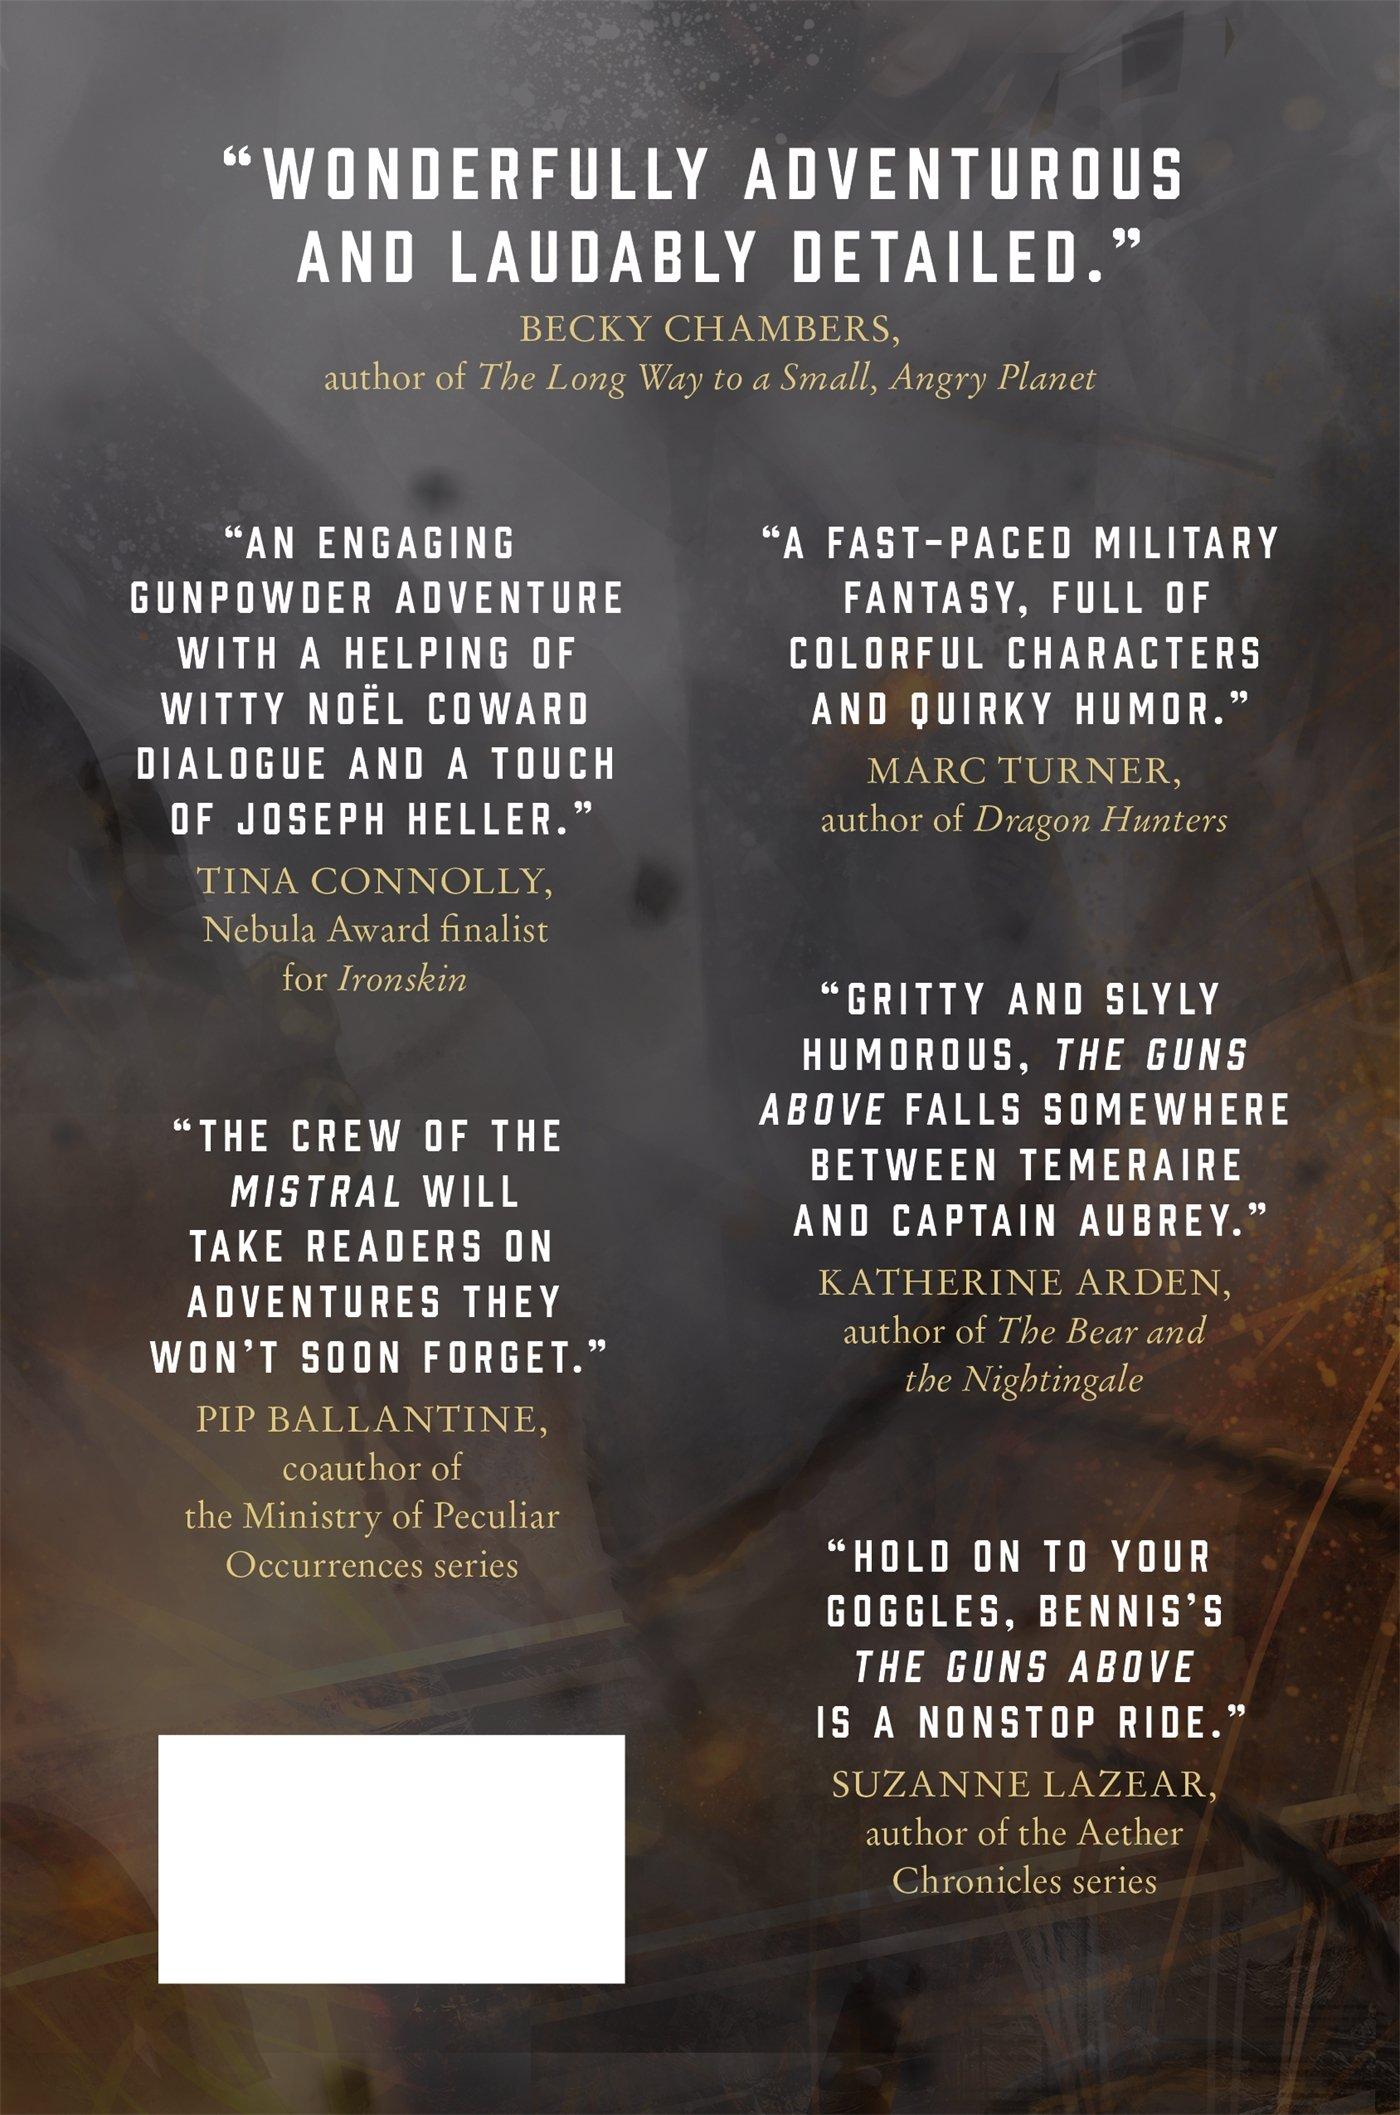 Amazon: The Guns Above (signal Airship) (9780765388766): Robyn Bennis:  Books